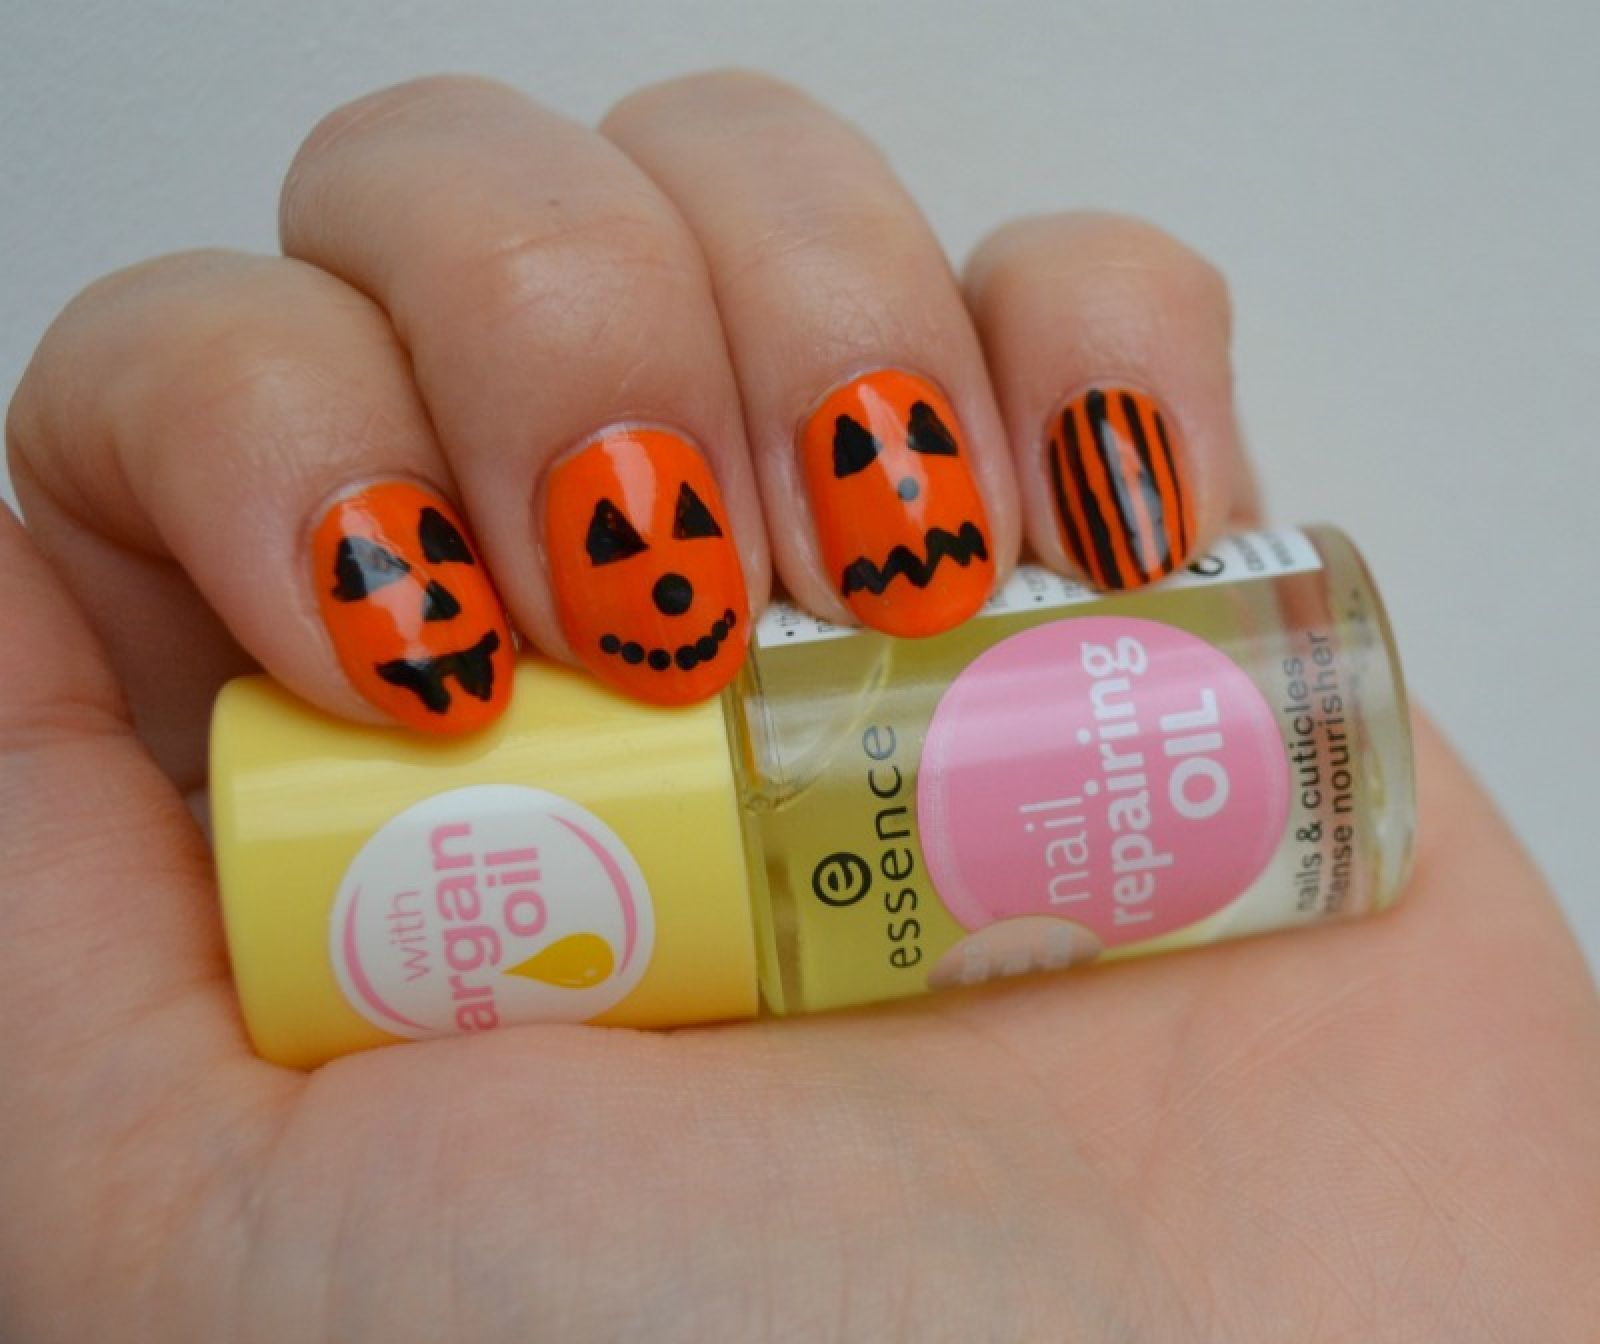 Essence Nail Repairing Oil Review And Simple Halloween Pumpkin Nail